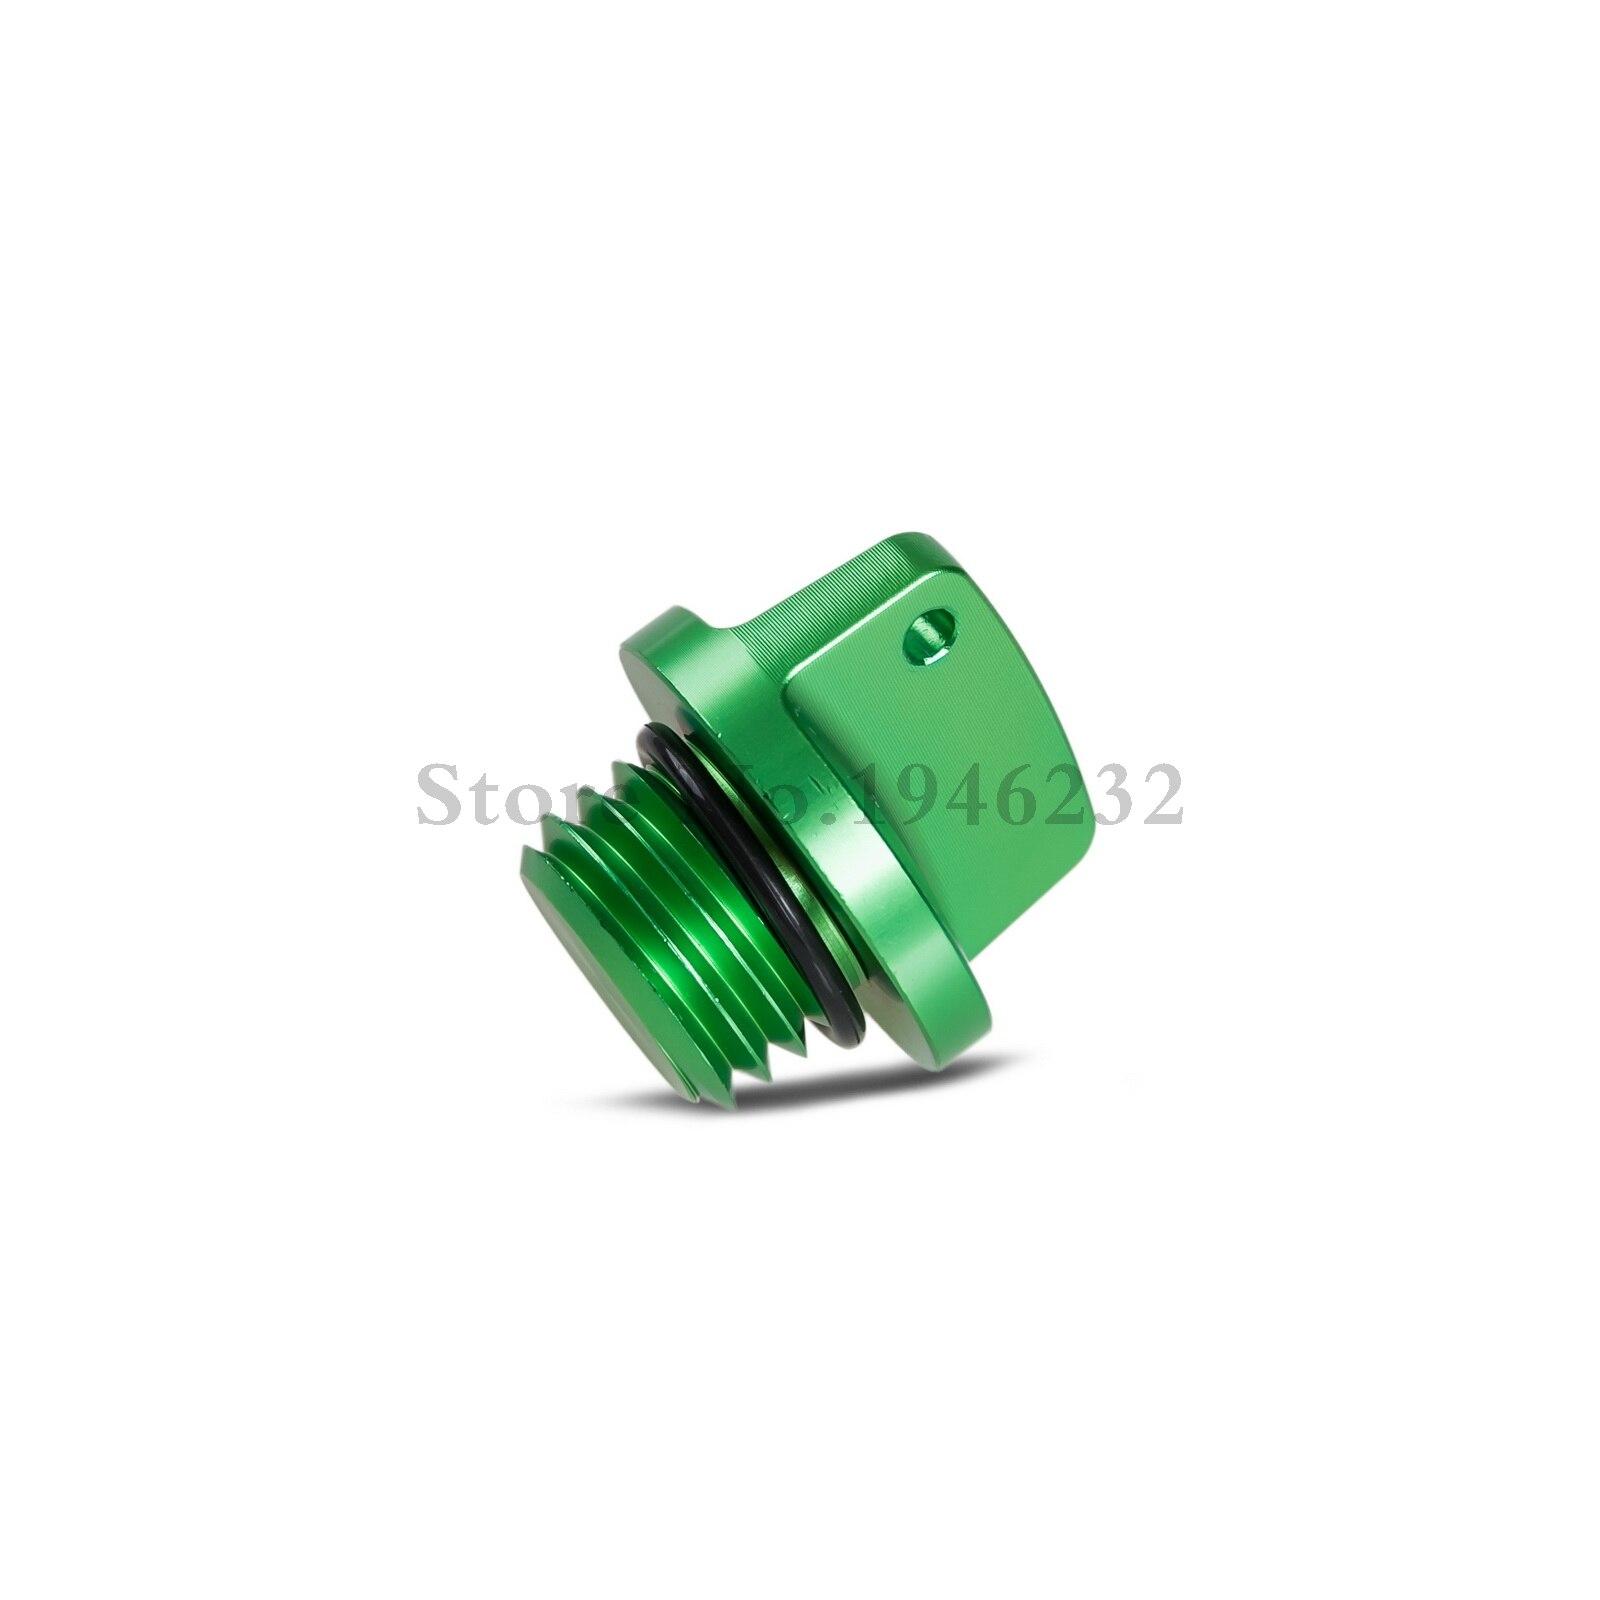 H2CNC Oil Filler Cap Plug For Kawasaki Z1000/SX/ABS Z800 ER6F ER6N ER4N Ninja 400 600R 650R 1000 Versys 650 1000 ZXR750 ZXR750R кухонная мойка ukinox stm 800 600 20 6